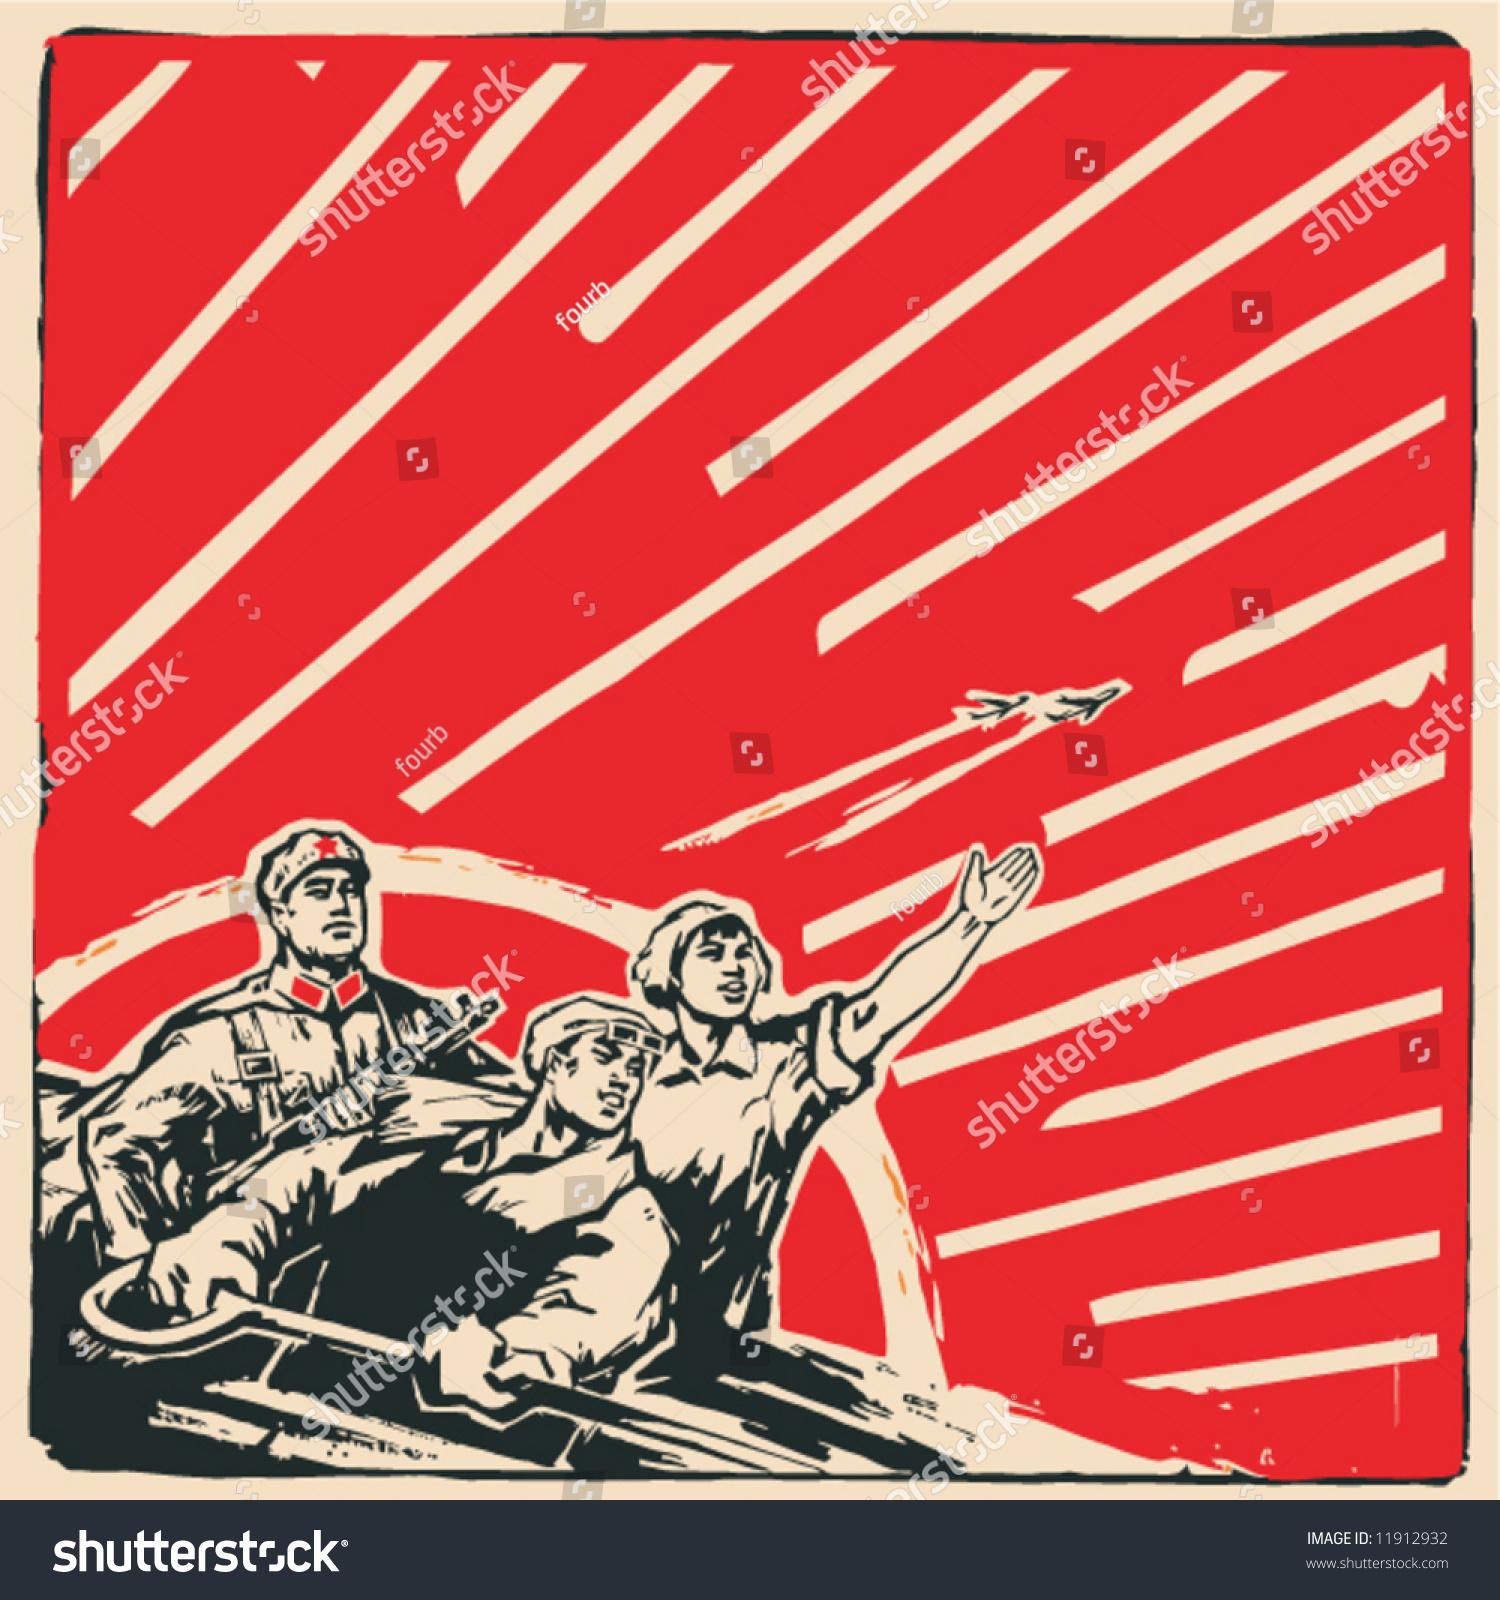 Old Communism Poster Stock Vector 11912932 - Shutterstock